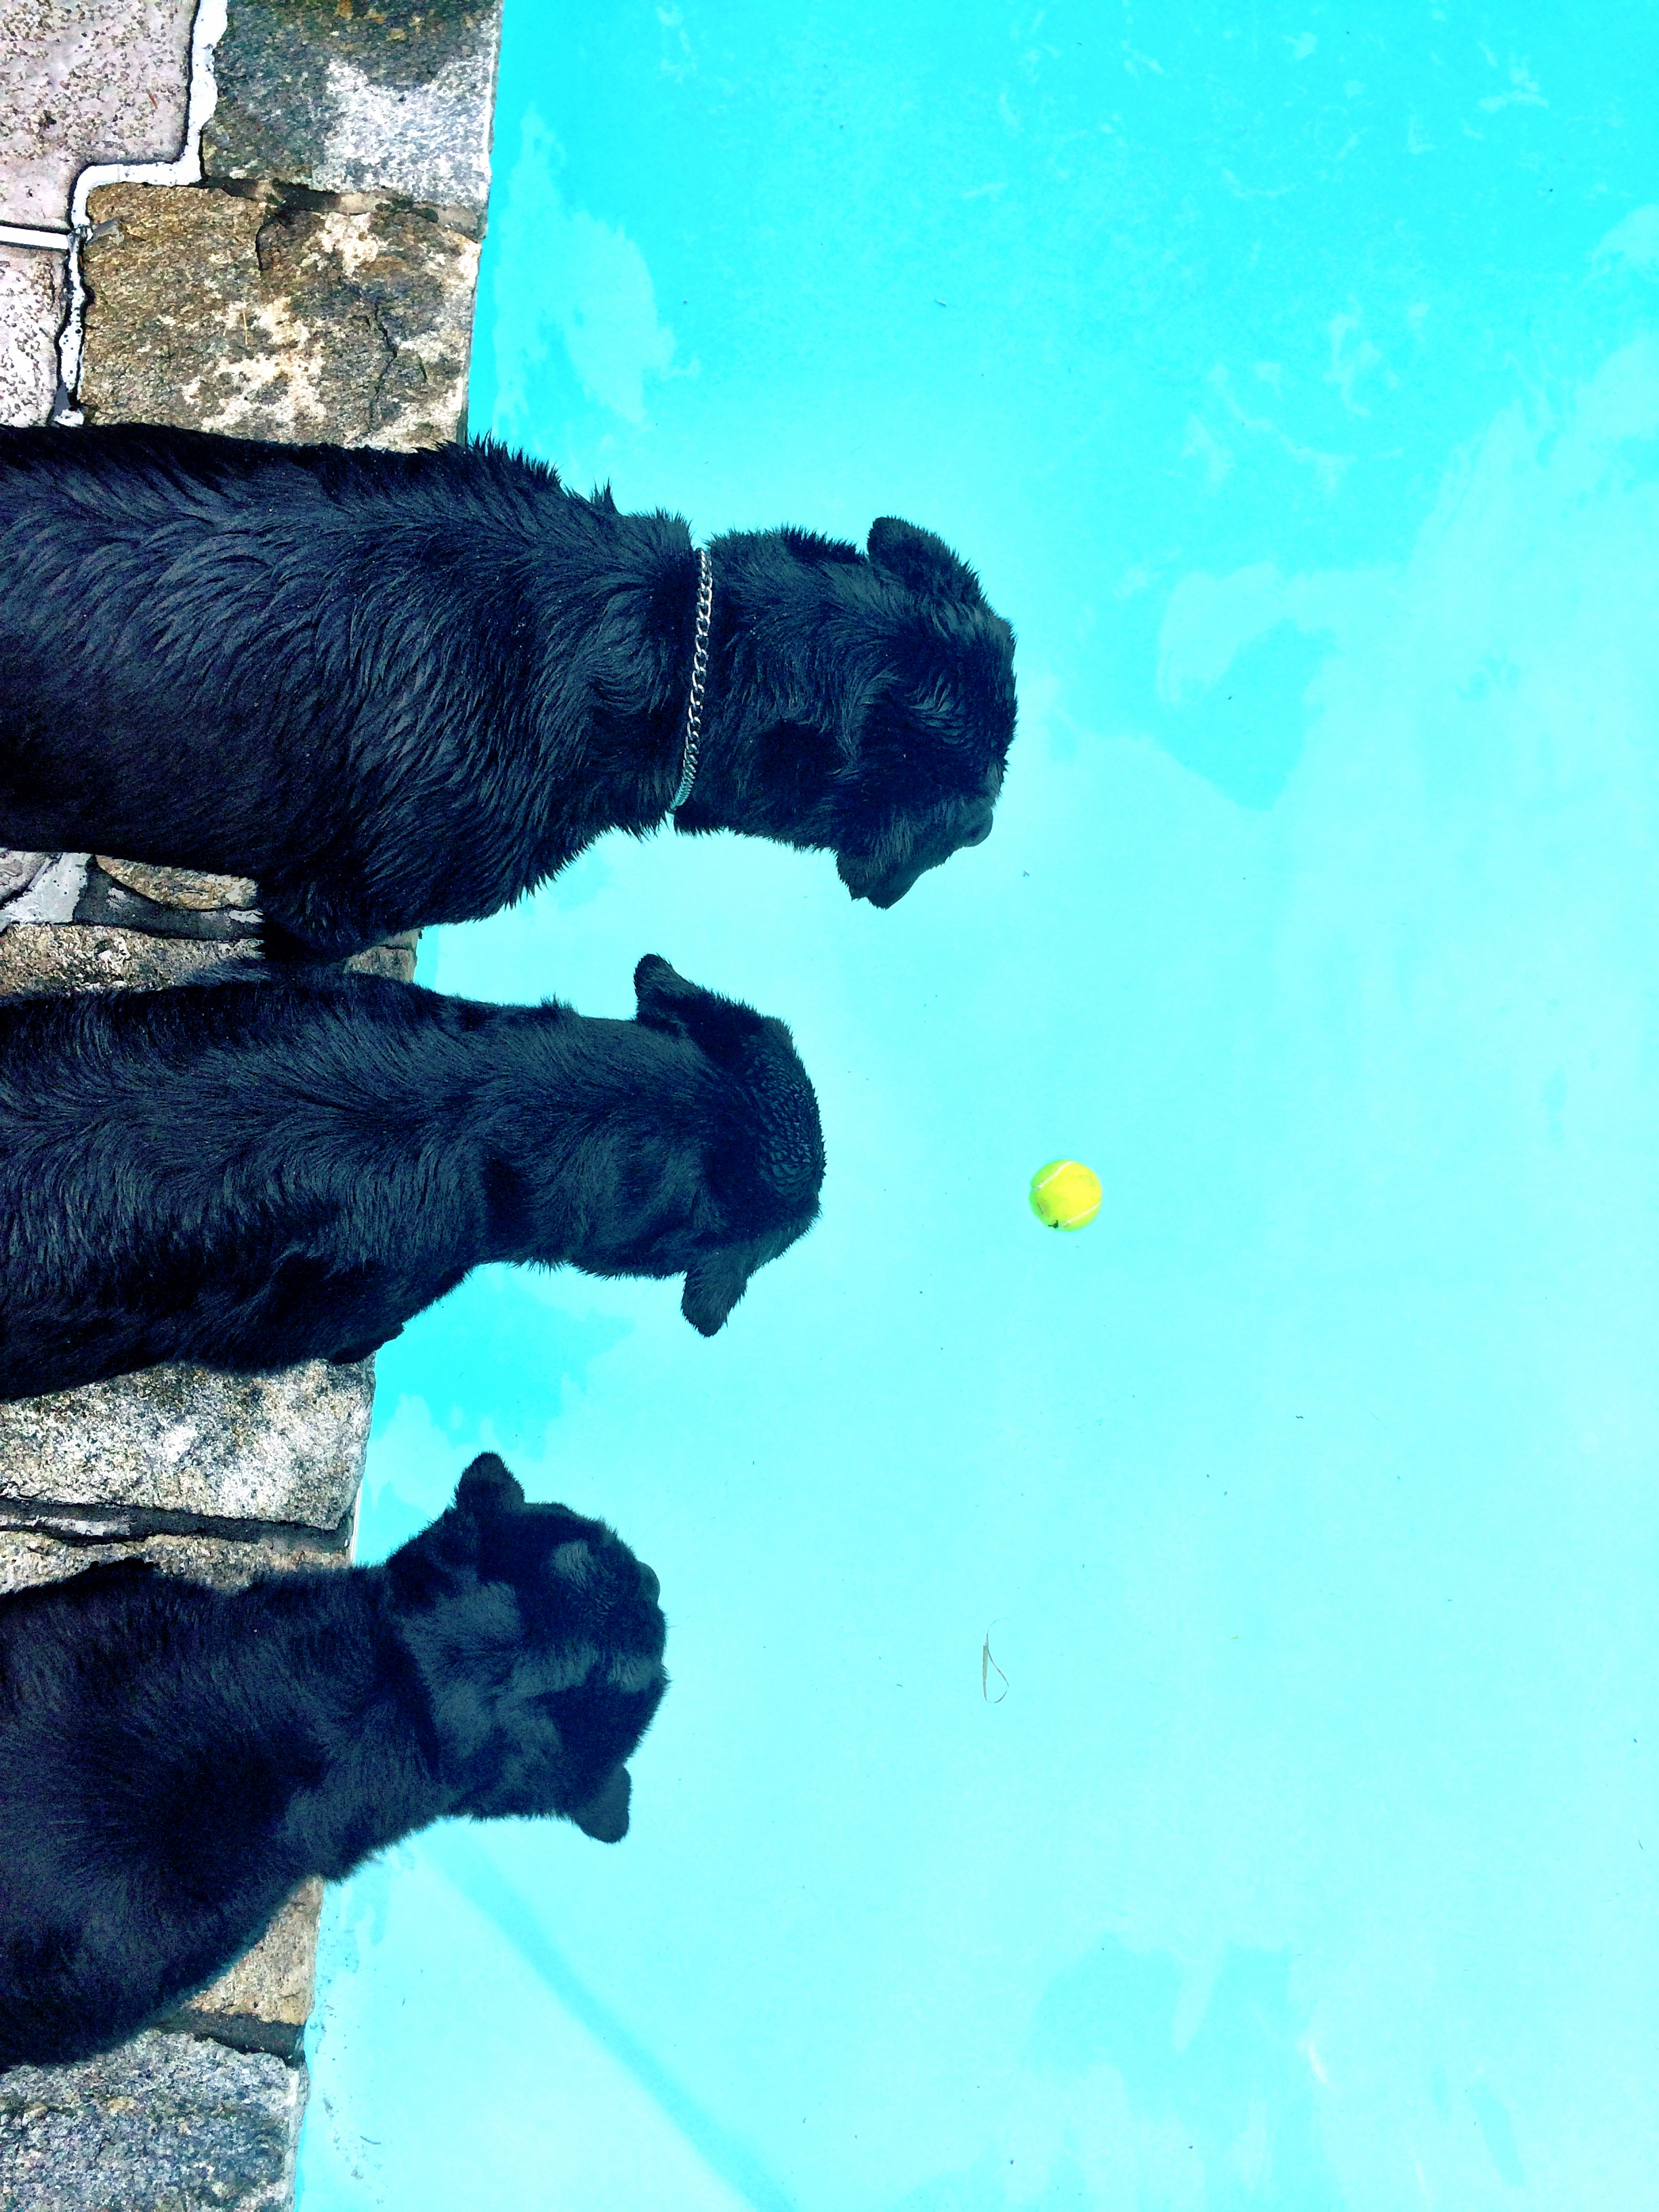 Many a tennis ball was retrieved this summer